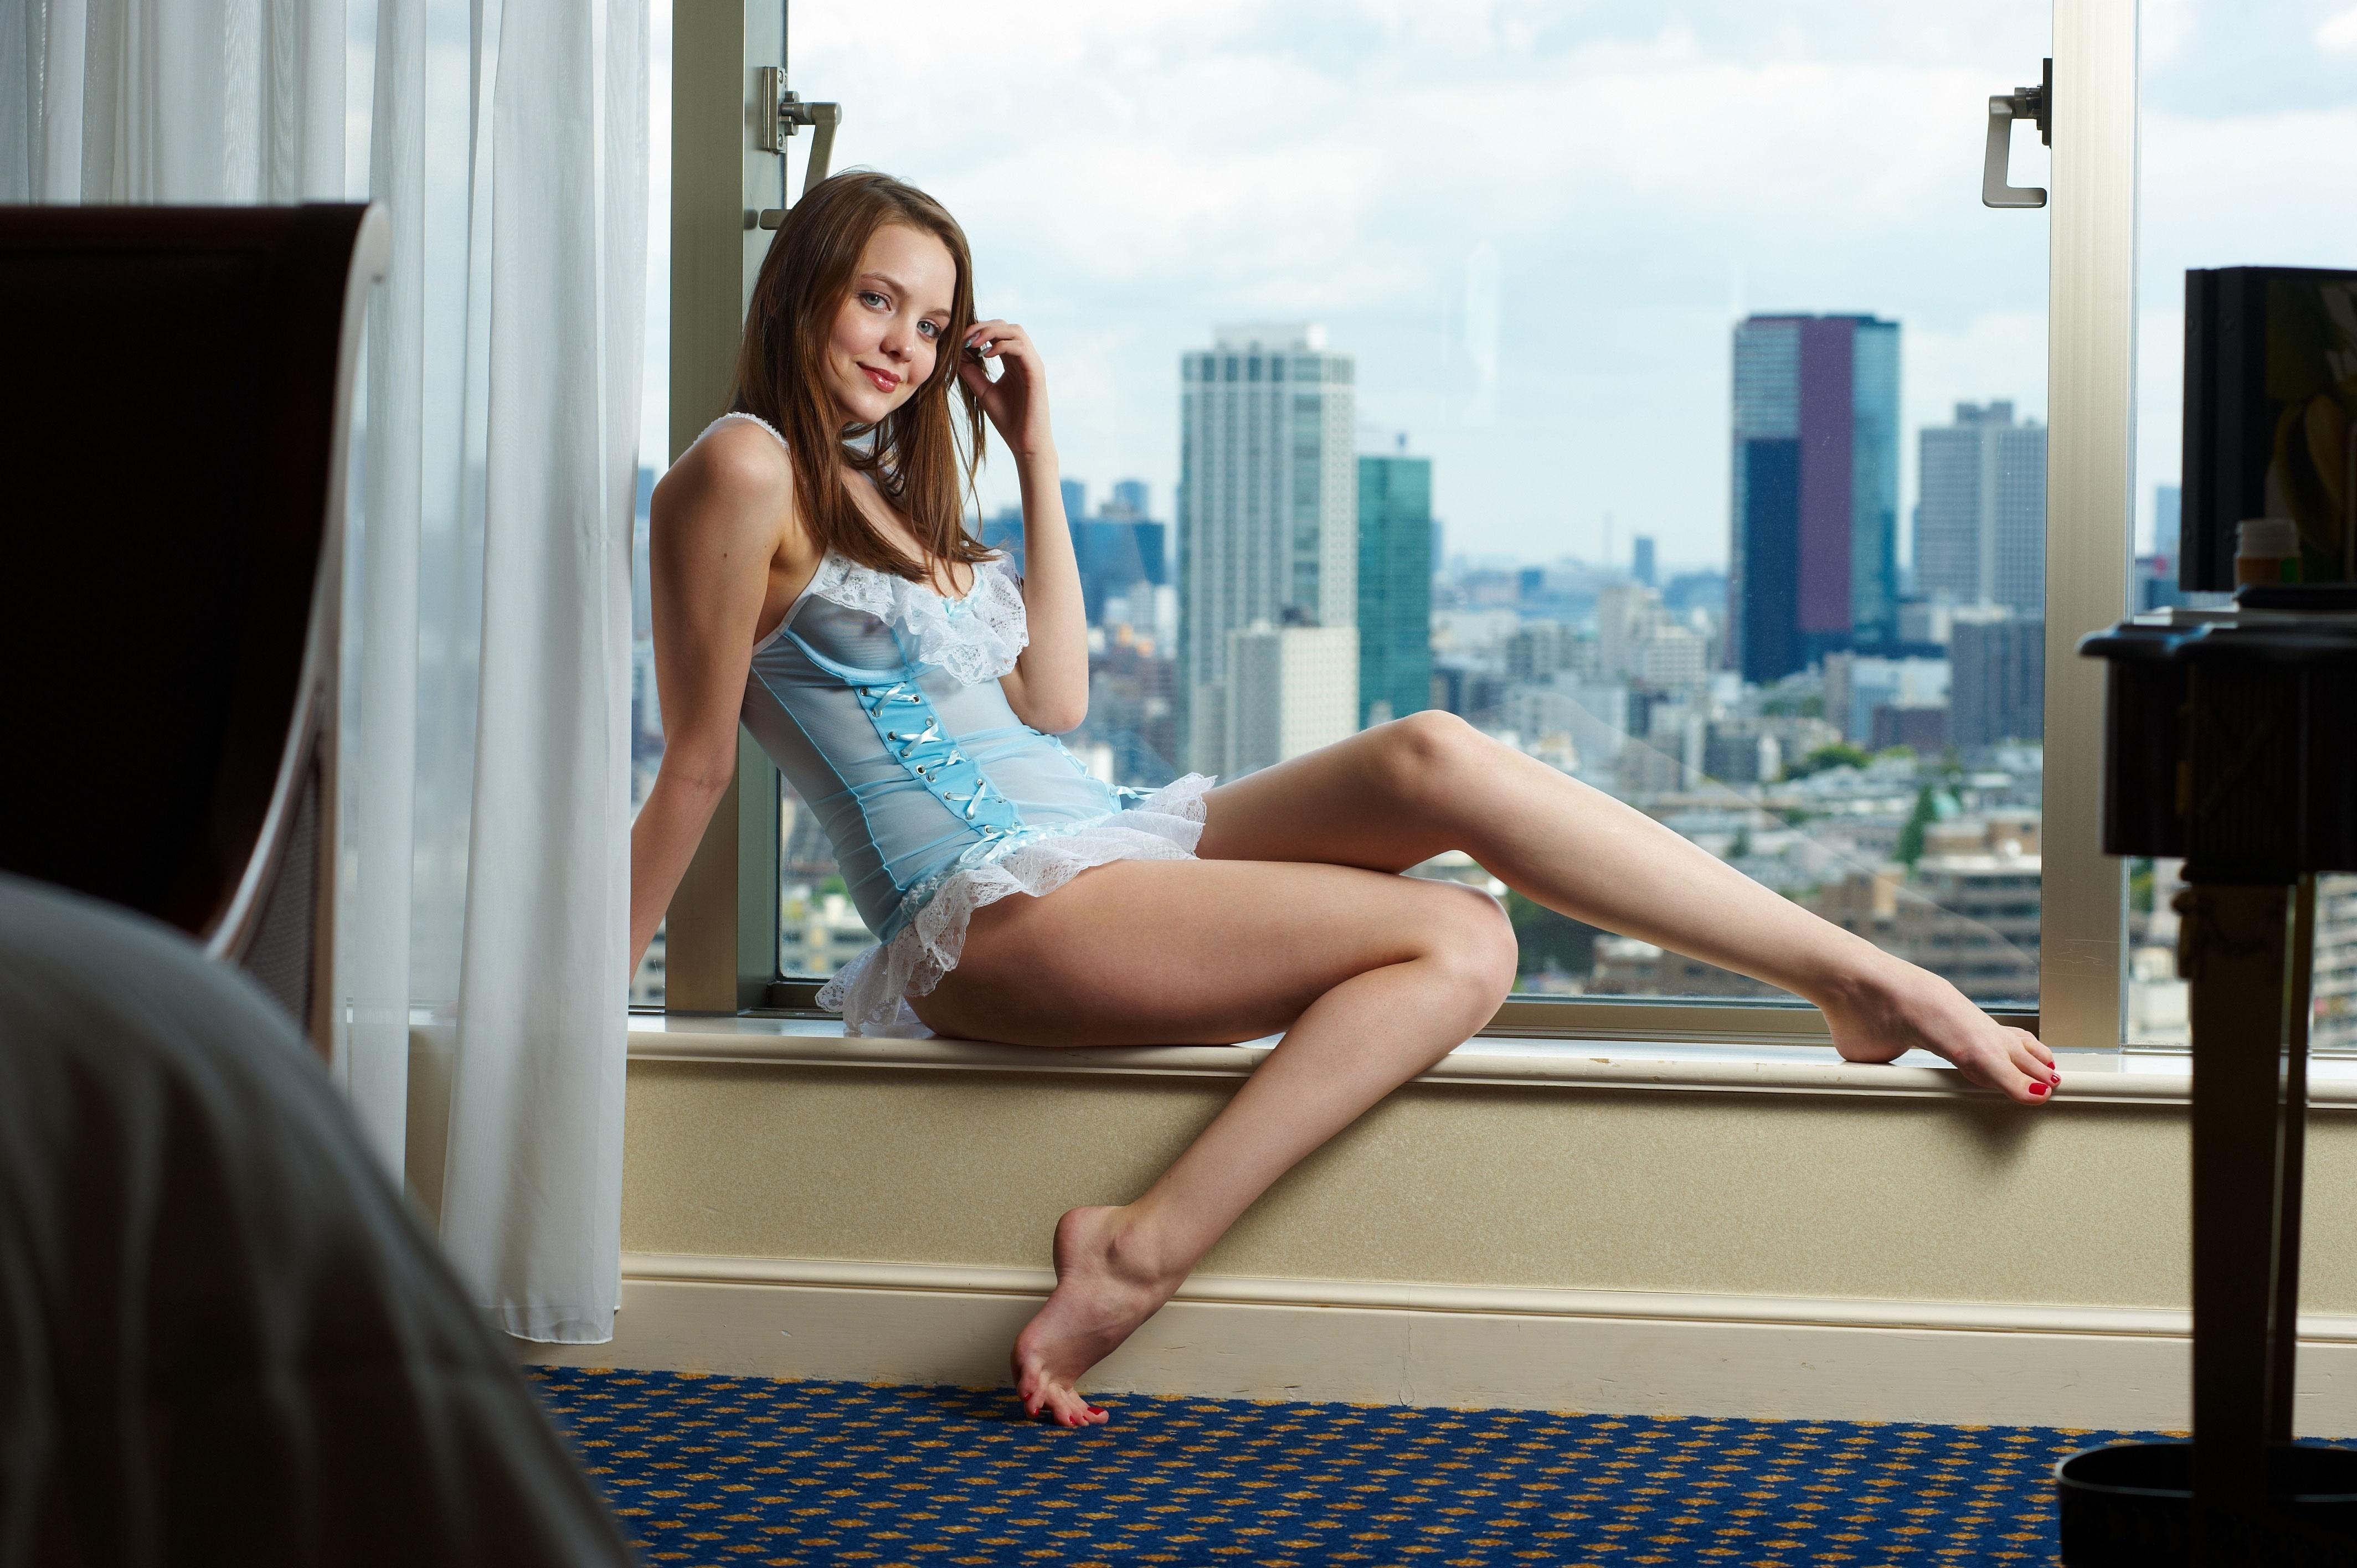 Wallpaper Amelie Sexy Girl Sweet Cute Model Lingerie Sexy Legs Window Long Hair View